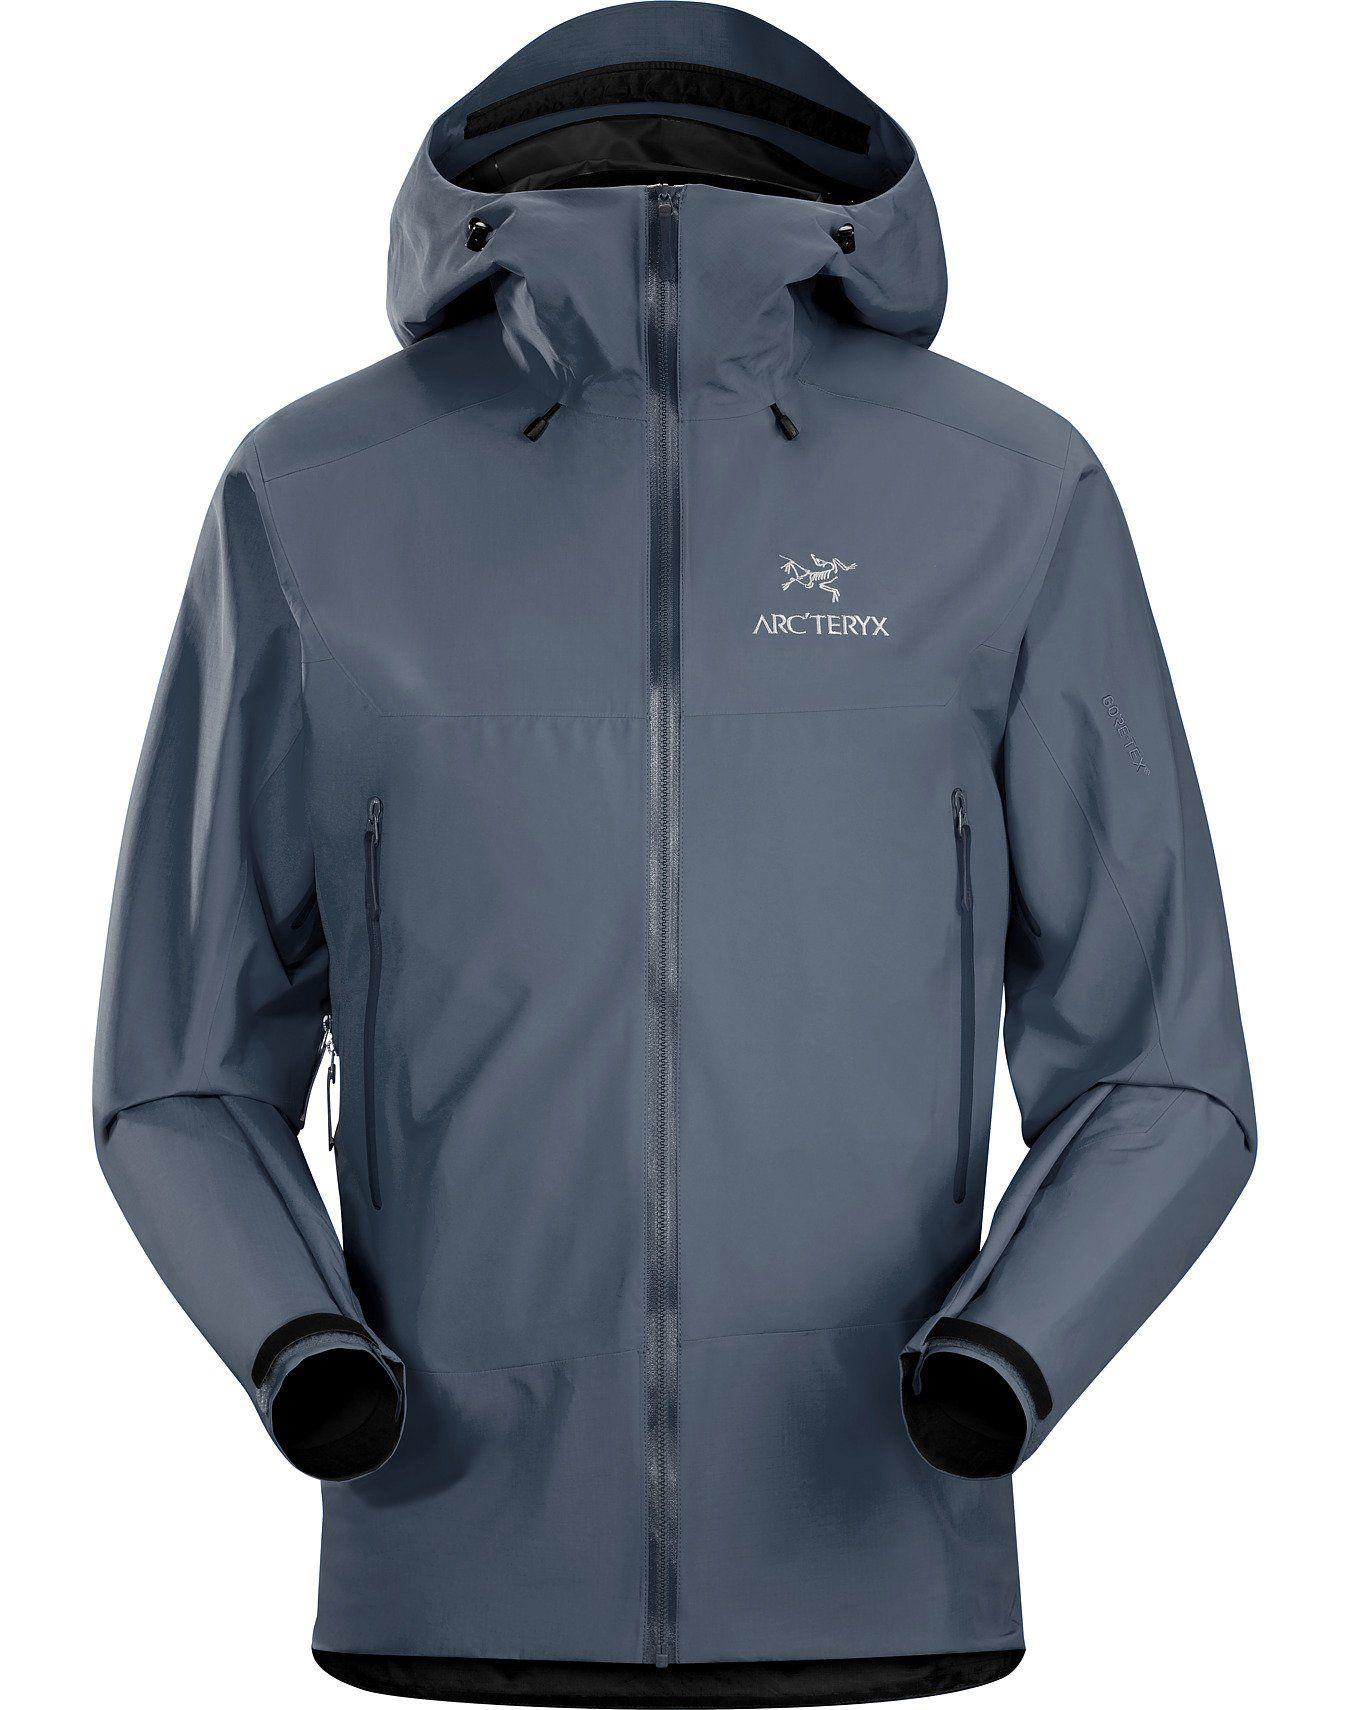 Beta Arc'teryx Arc'teryx SL Men's Hybrid Jacket Xq7qa5gHxw